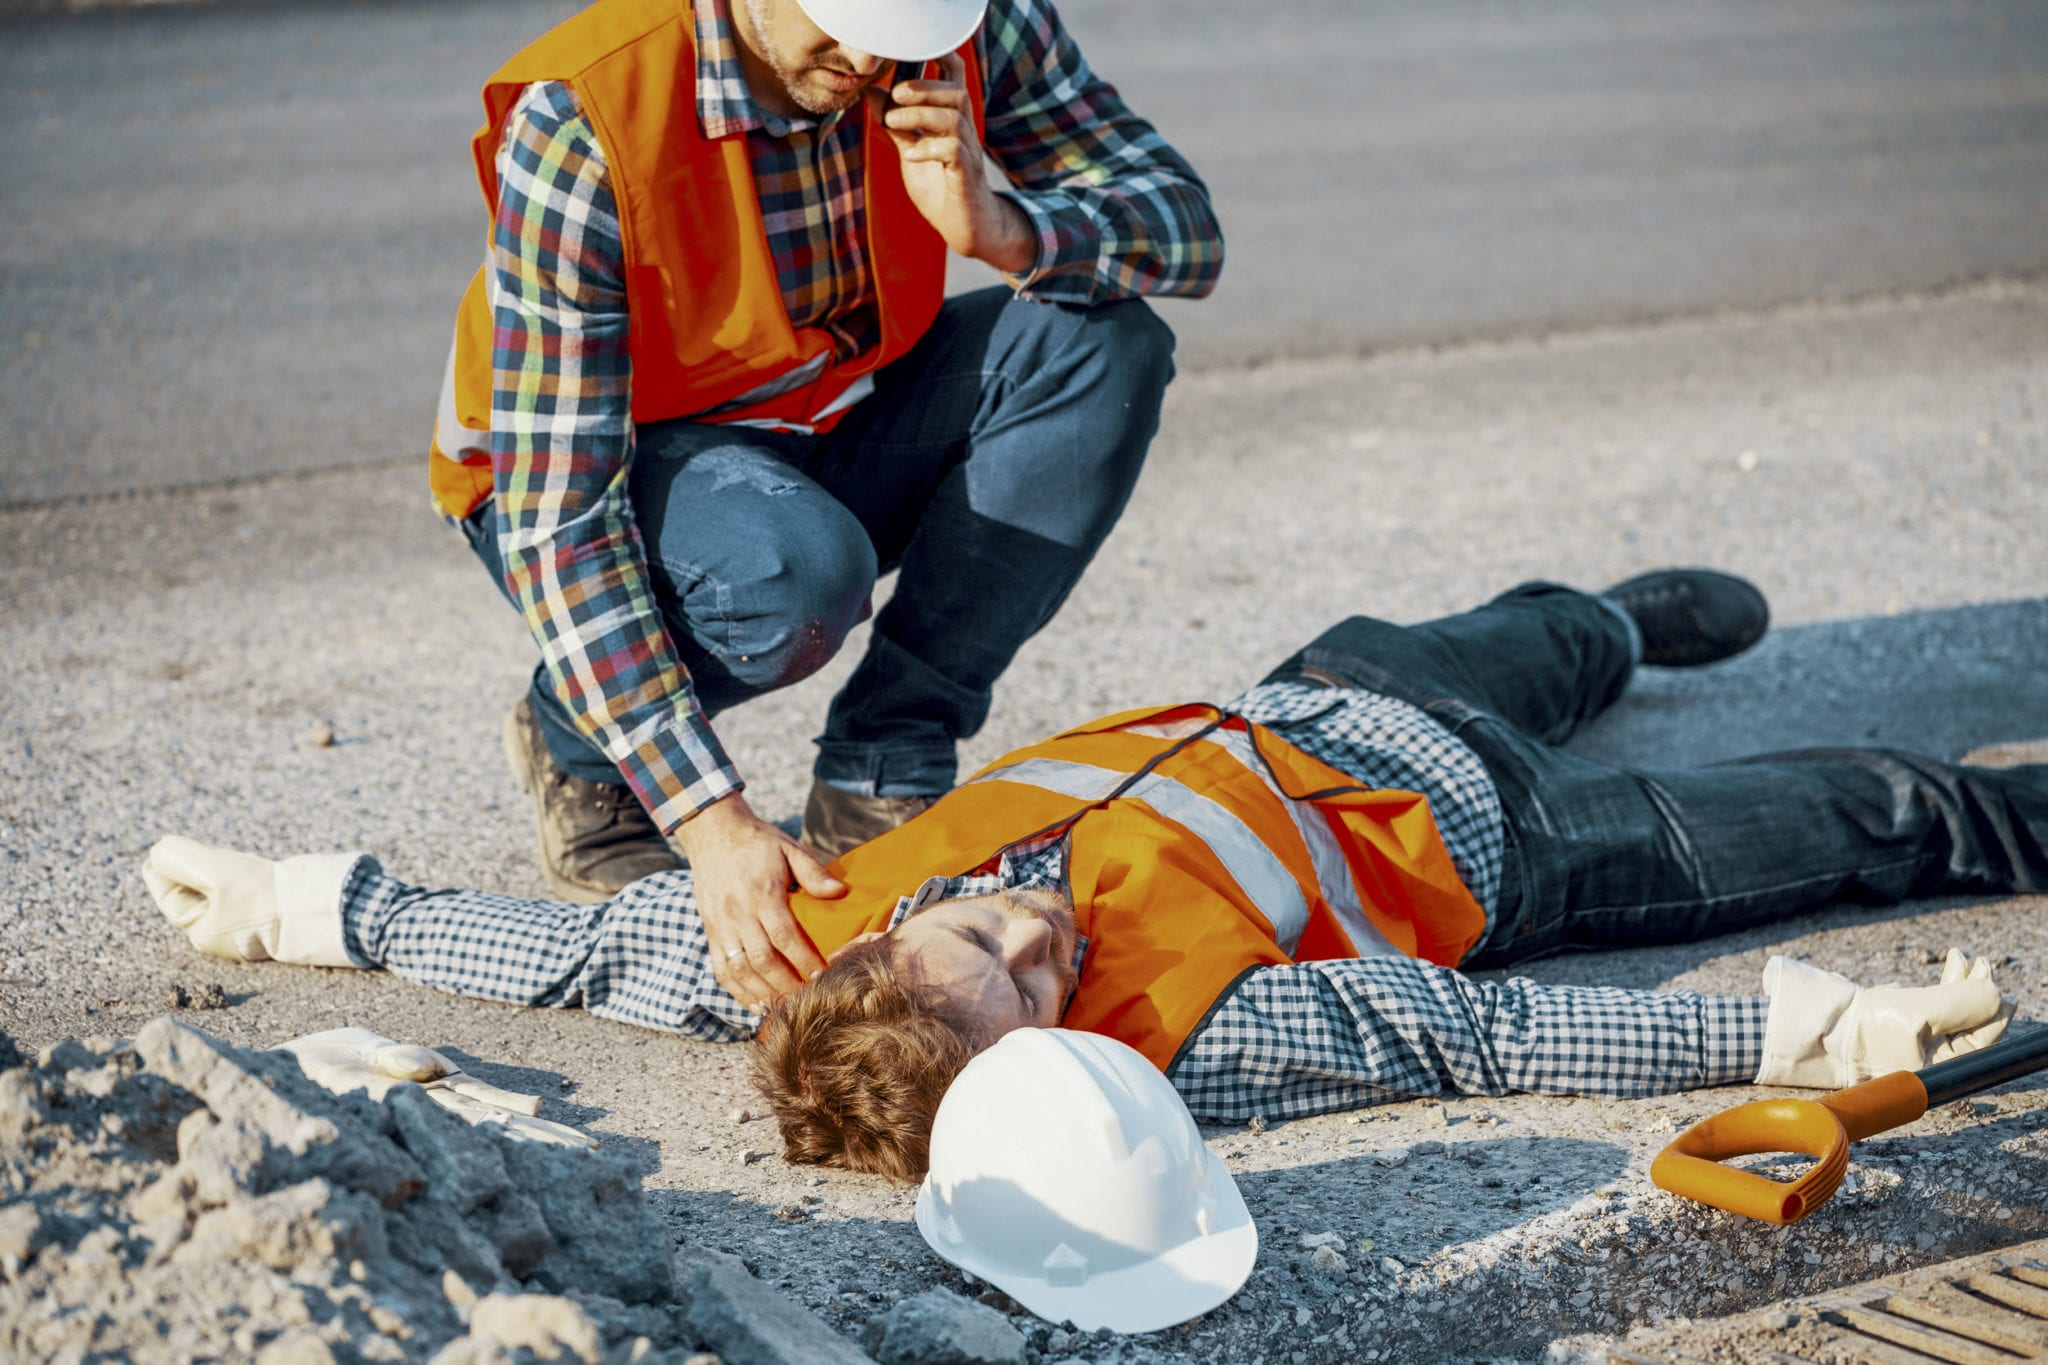 How Do Construction Crane Accidents Happen in Texas?